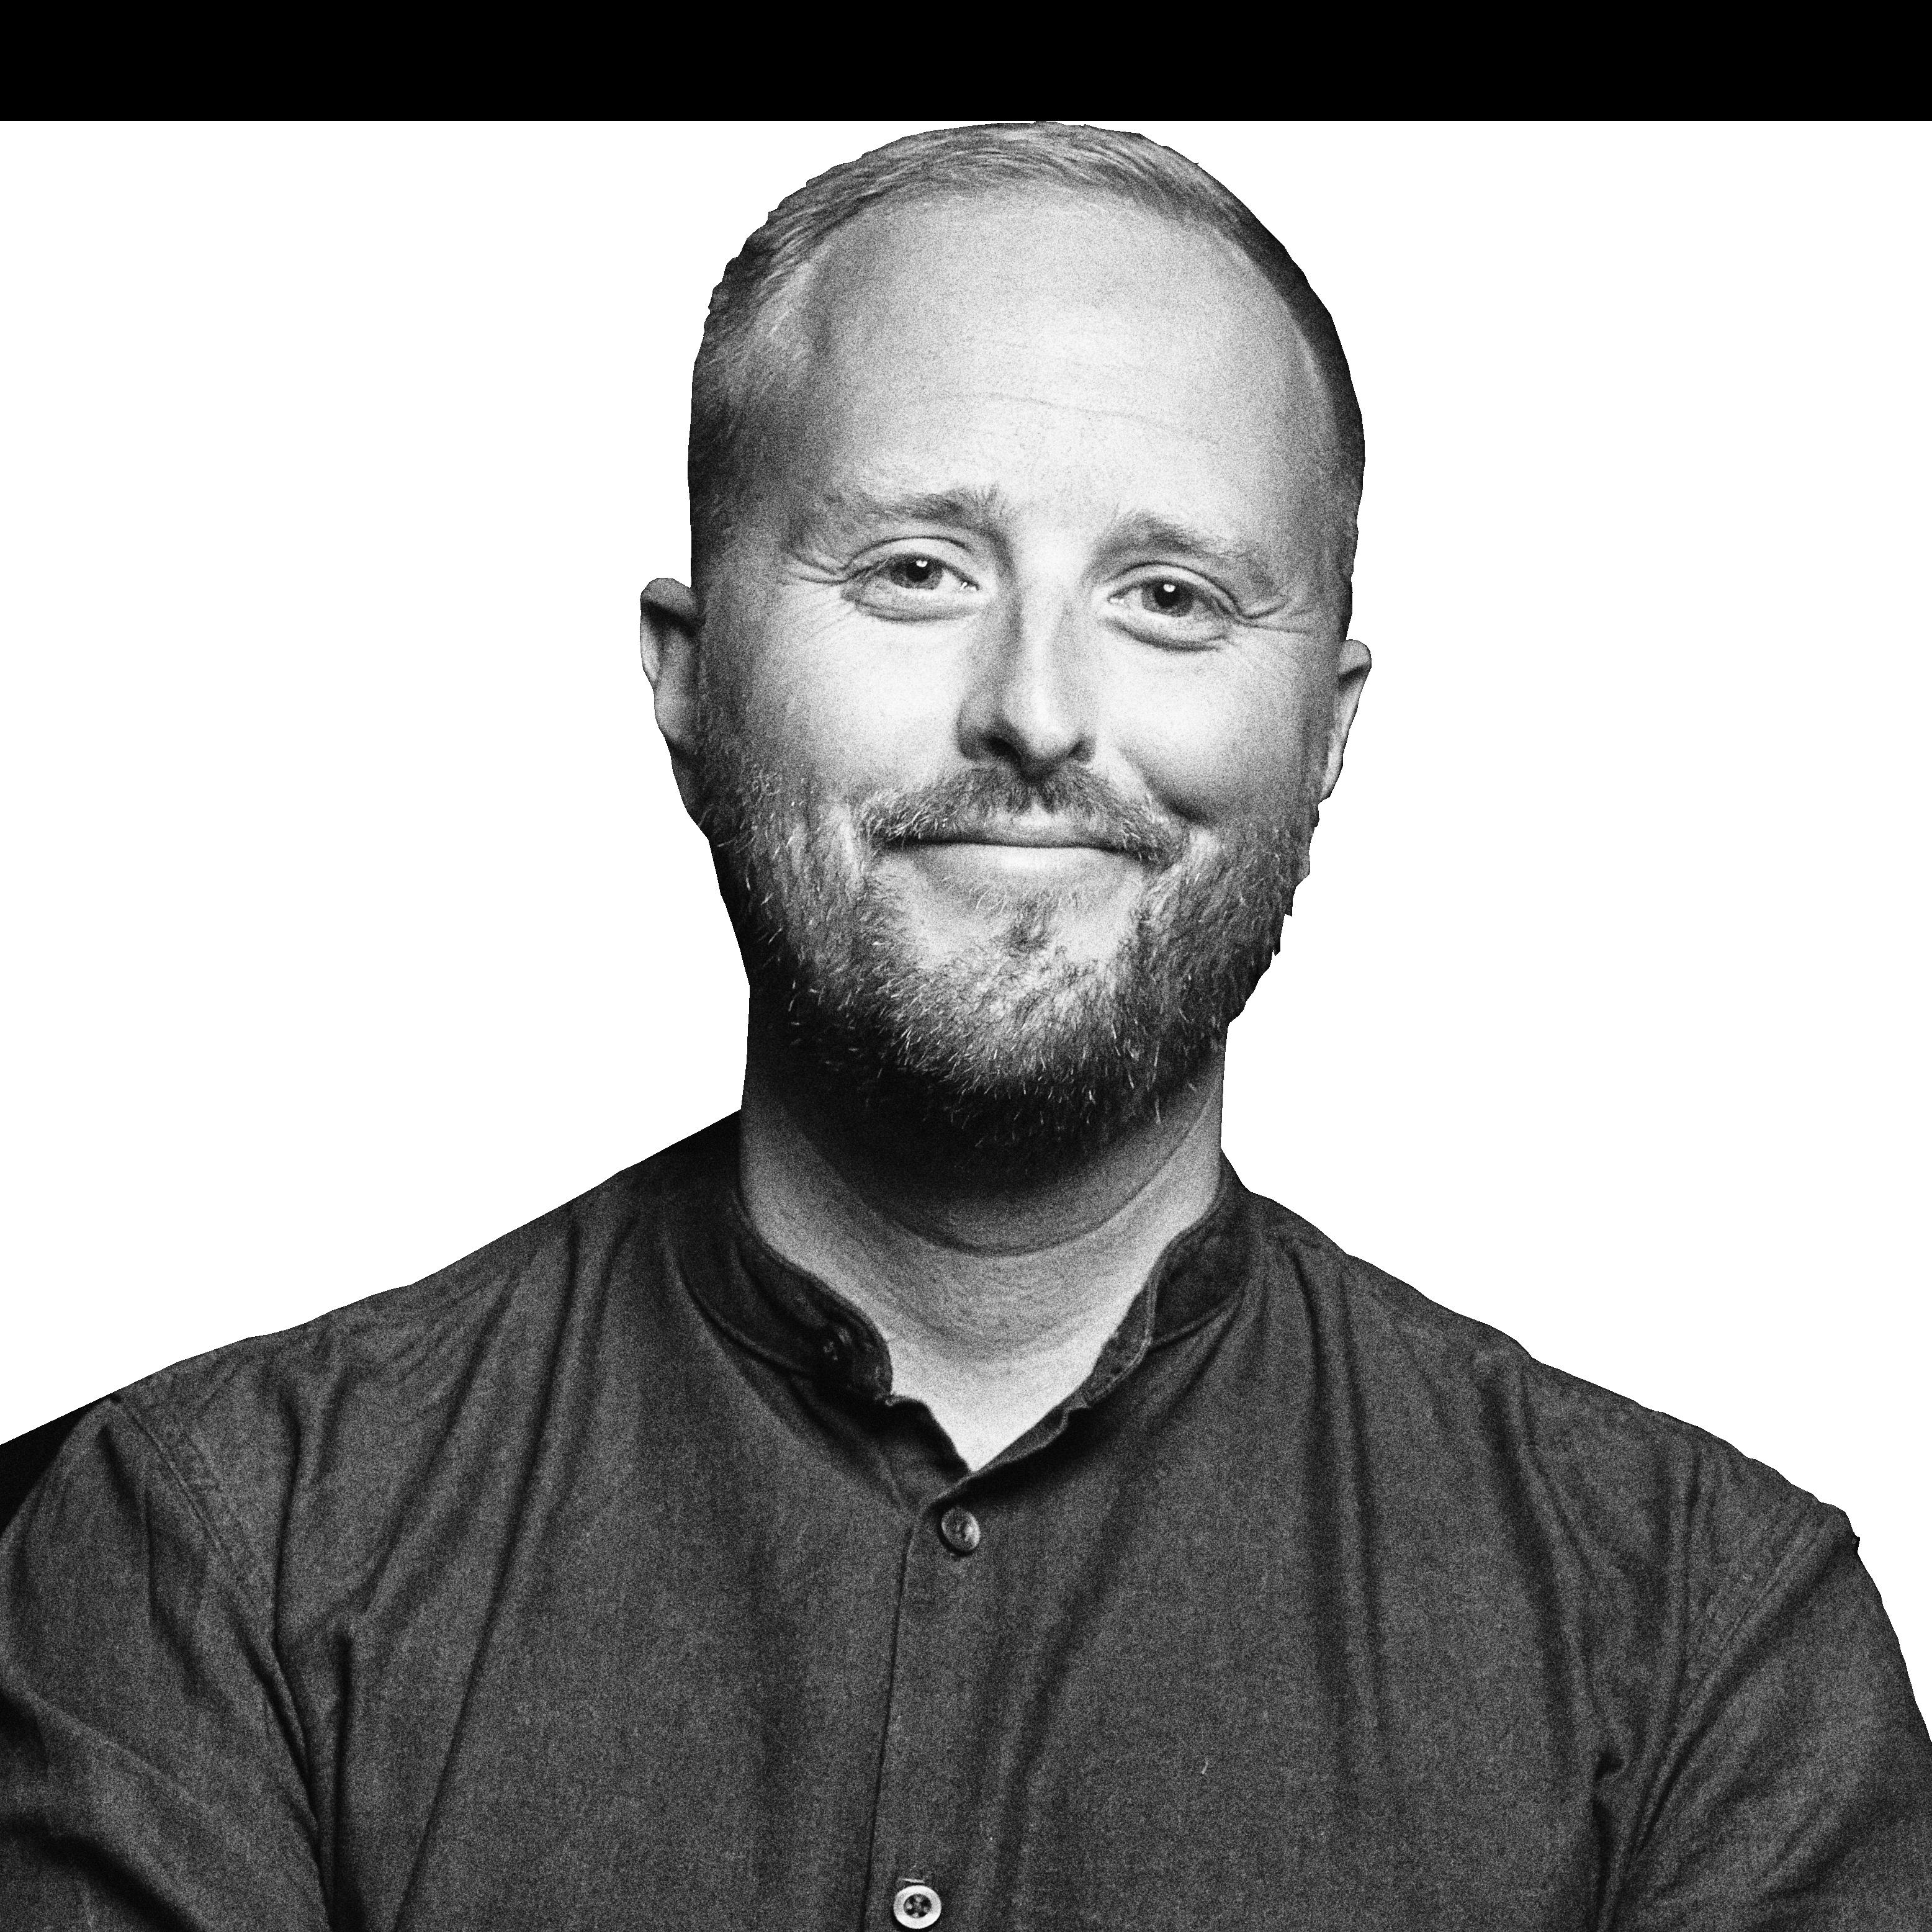 Andreas Markdalen